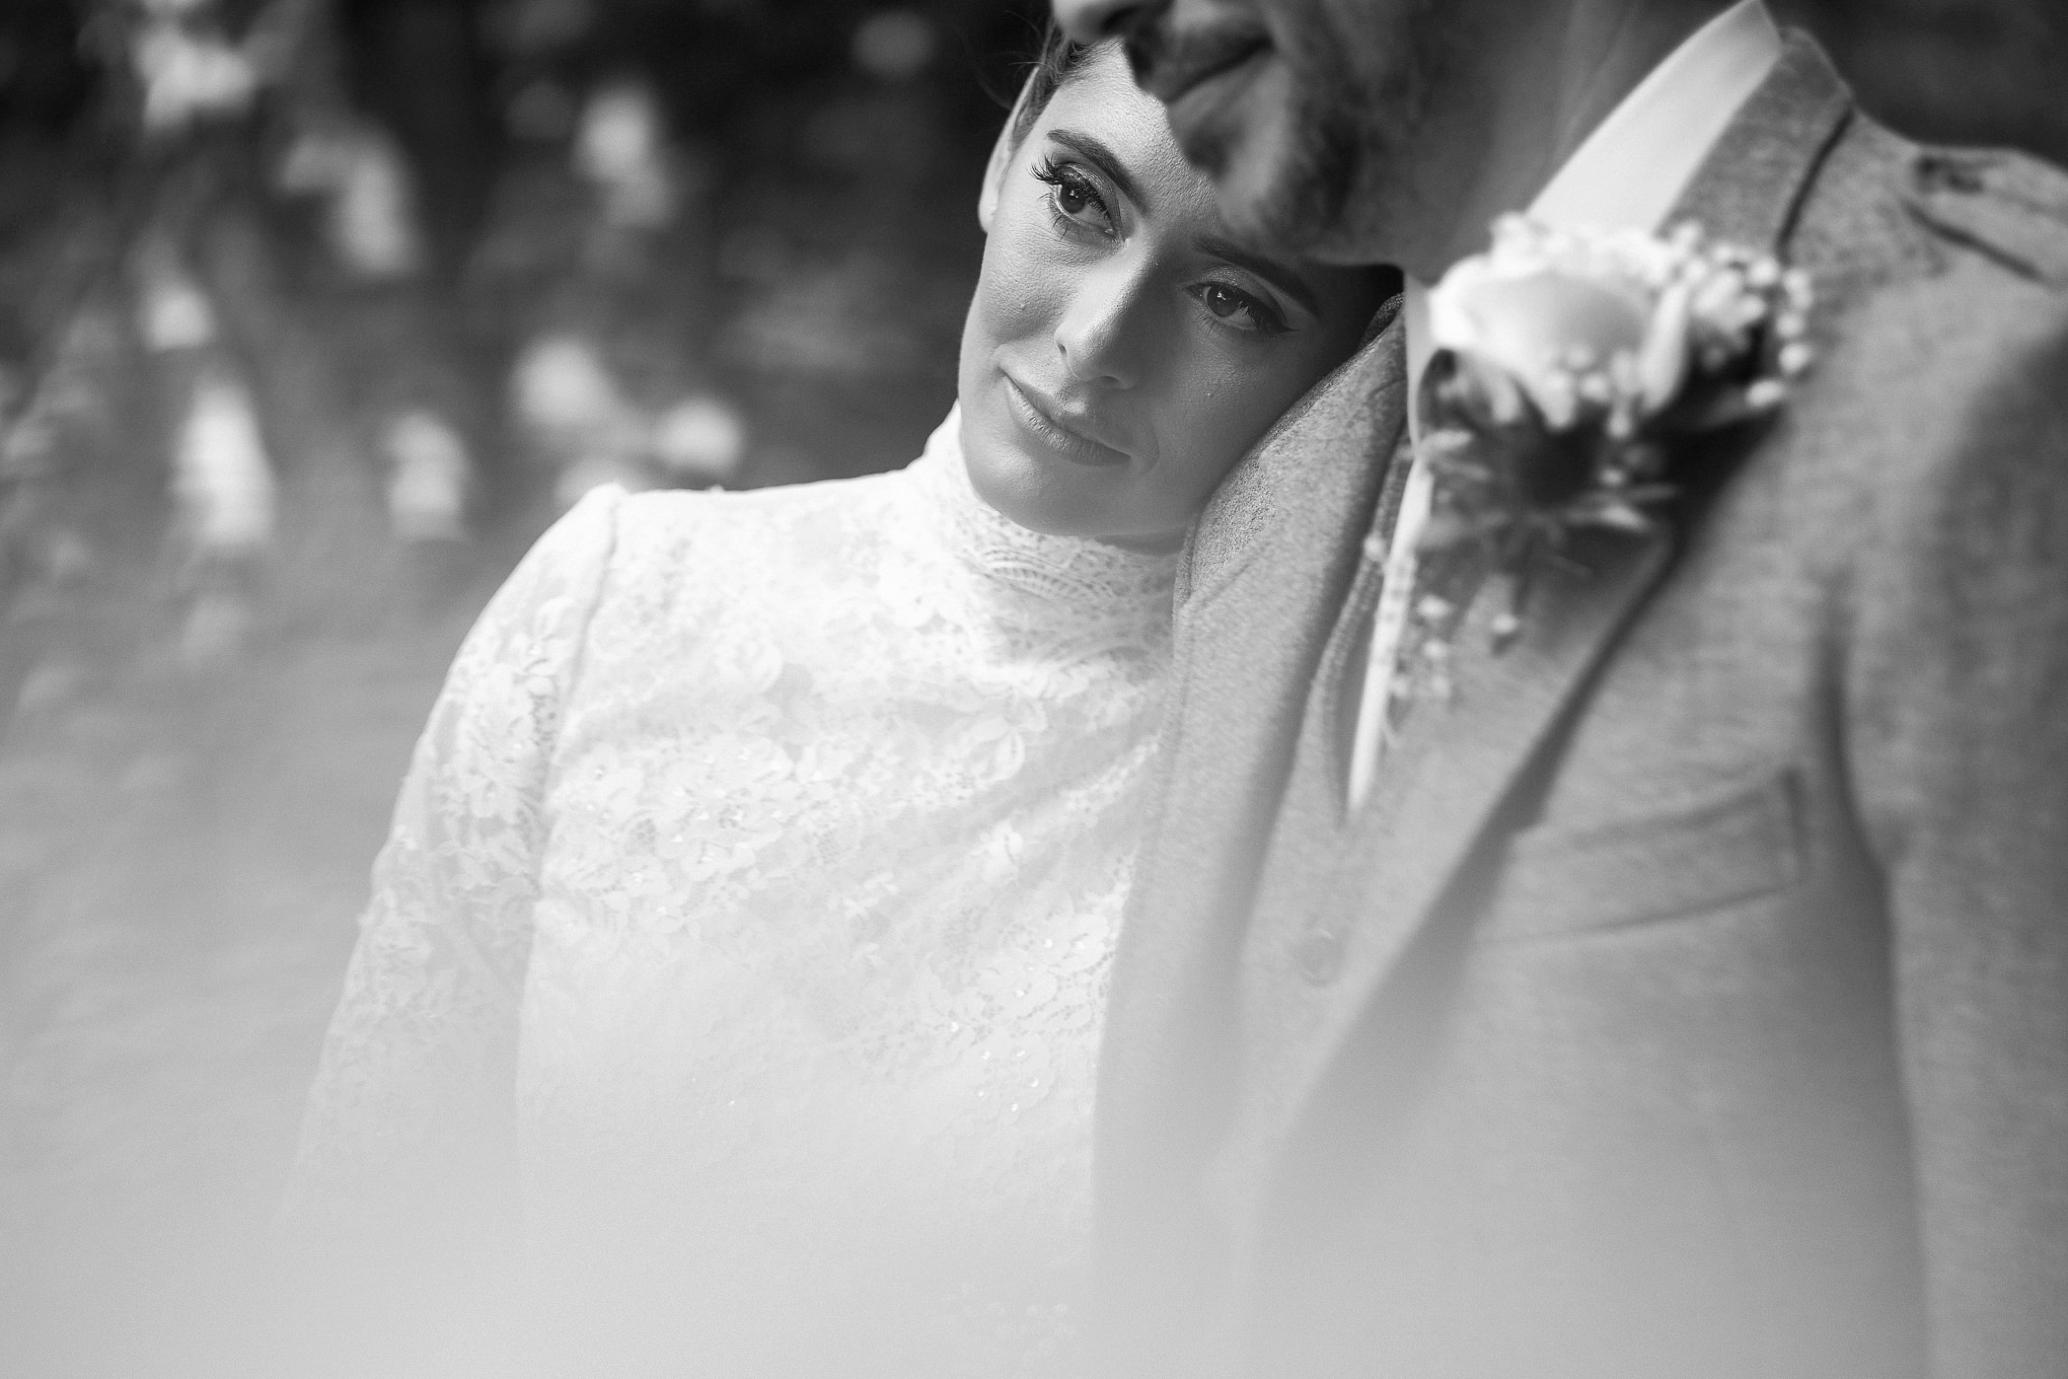 20170525_euan robertson weddings_049_WEB.jpg